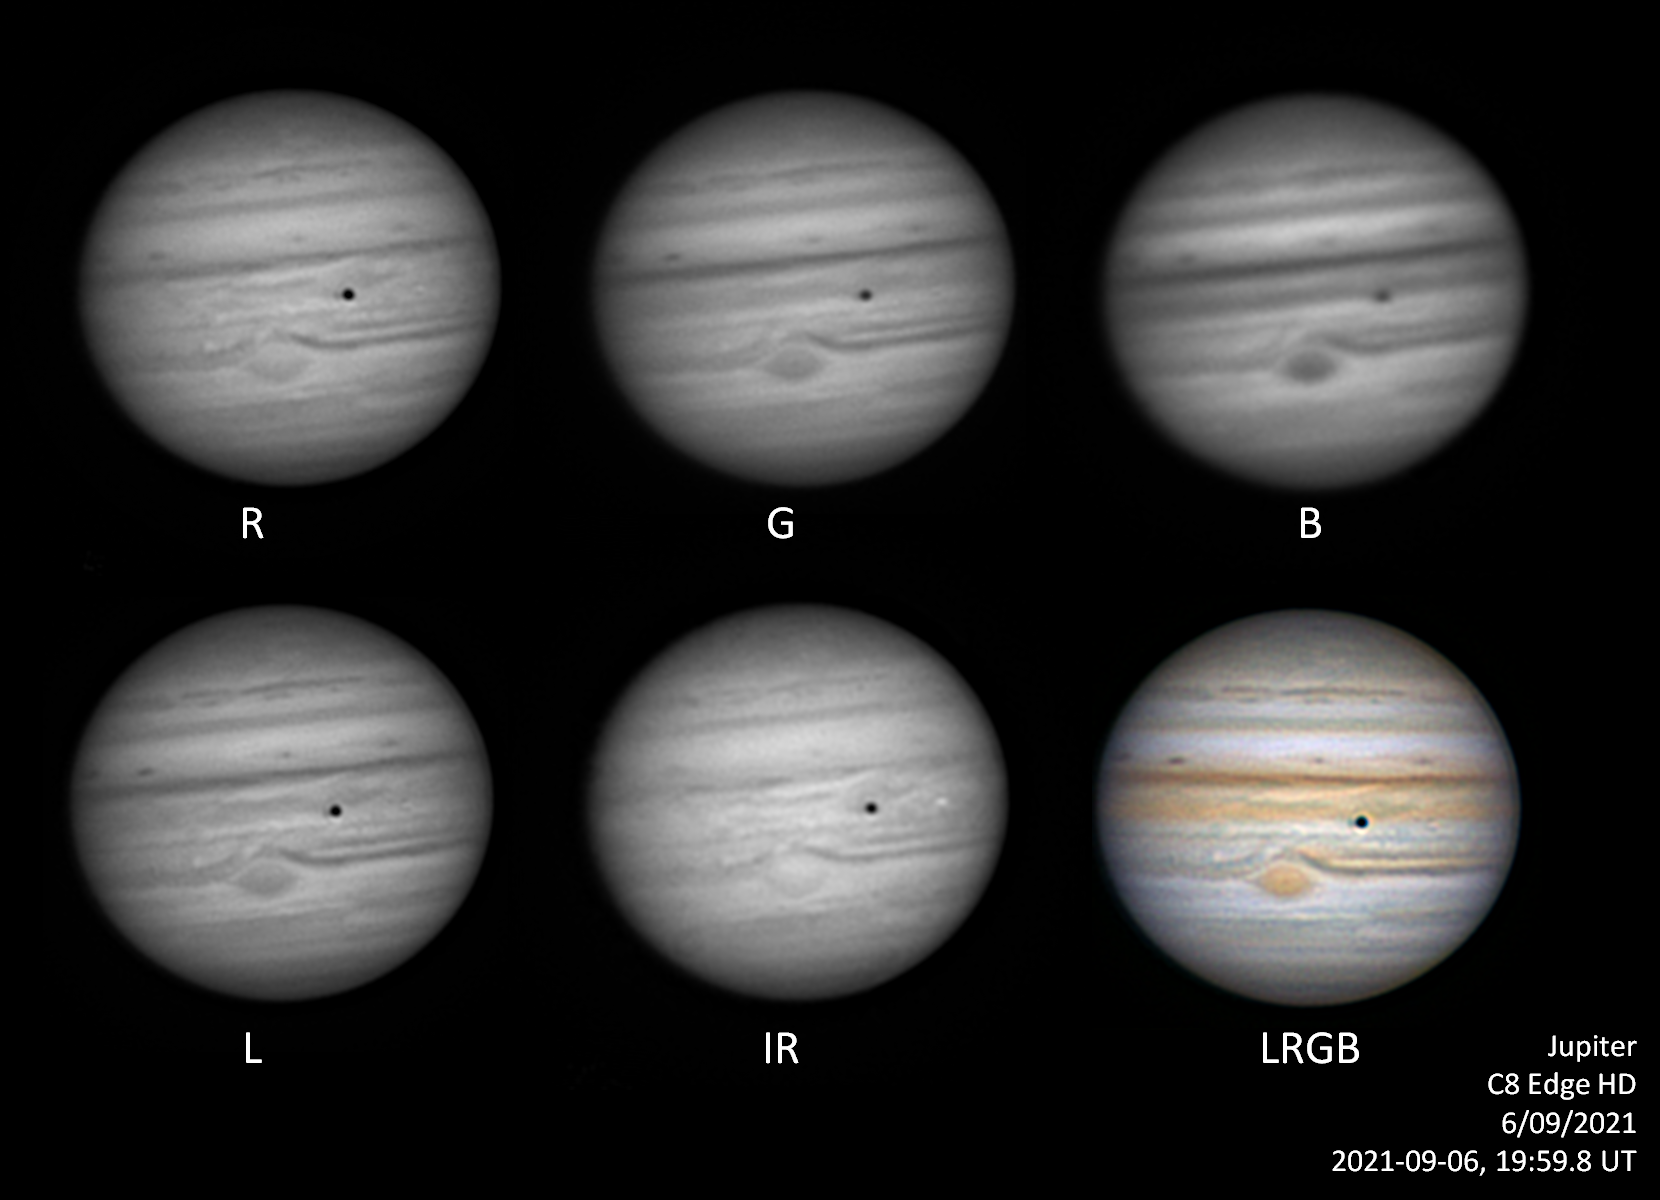 Jupiter_06092021.png.2492e59eaa2d8be3a1f05bd39d6d4e0e.png